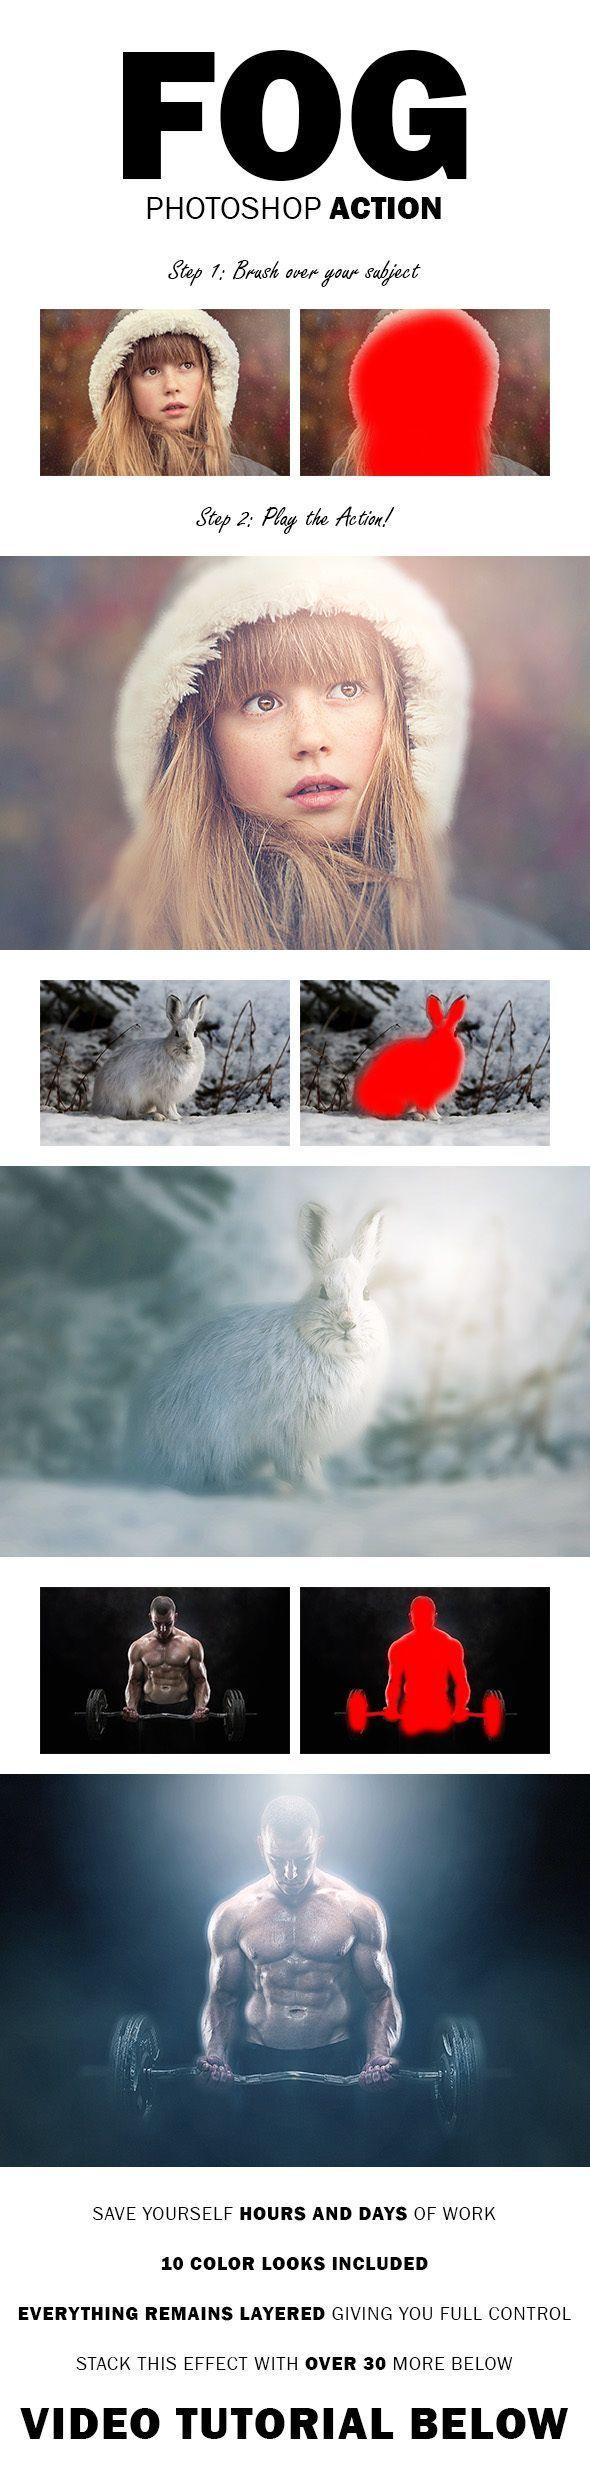 Fog - Photoshop Action. Nordic360. Photoshop tips.